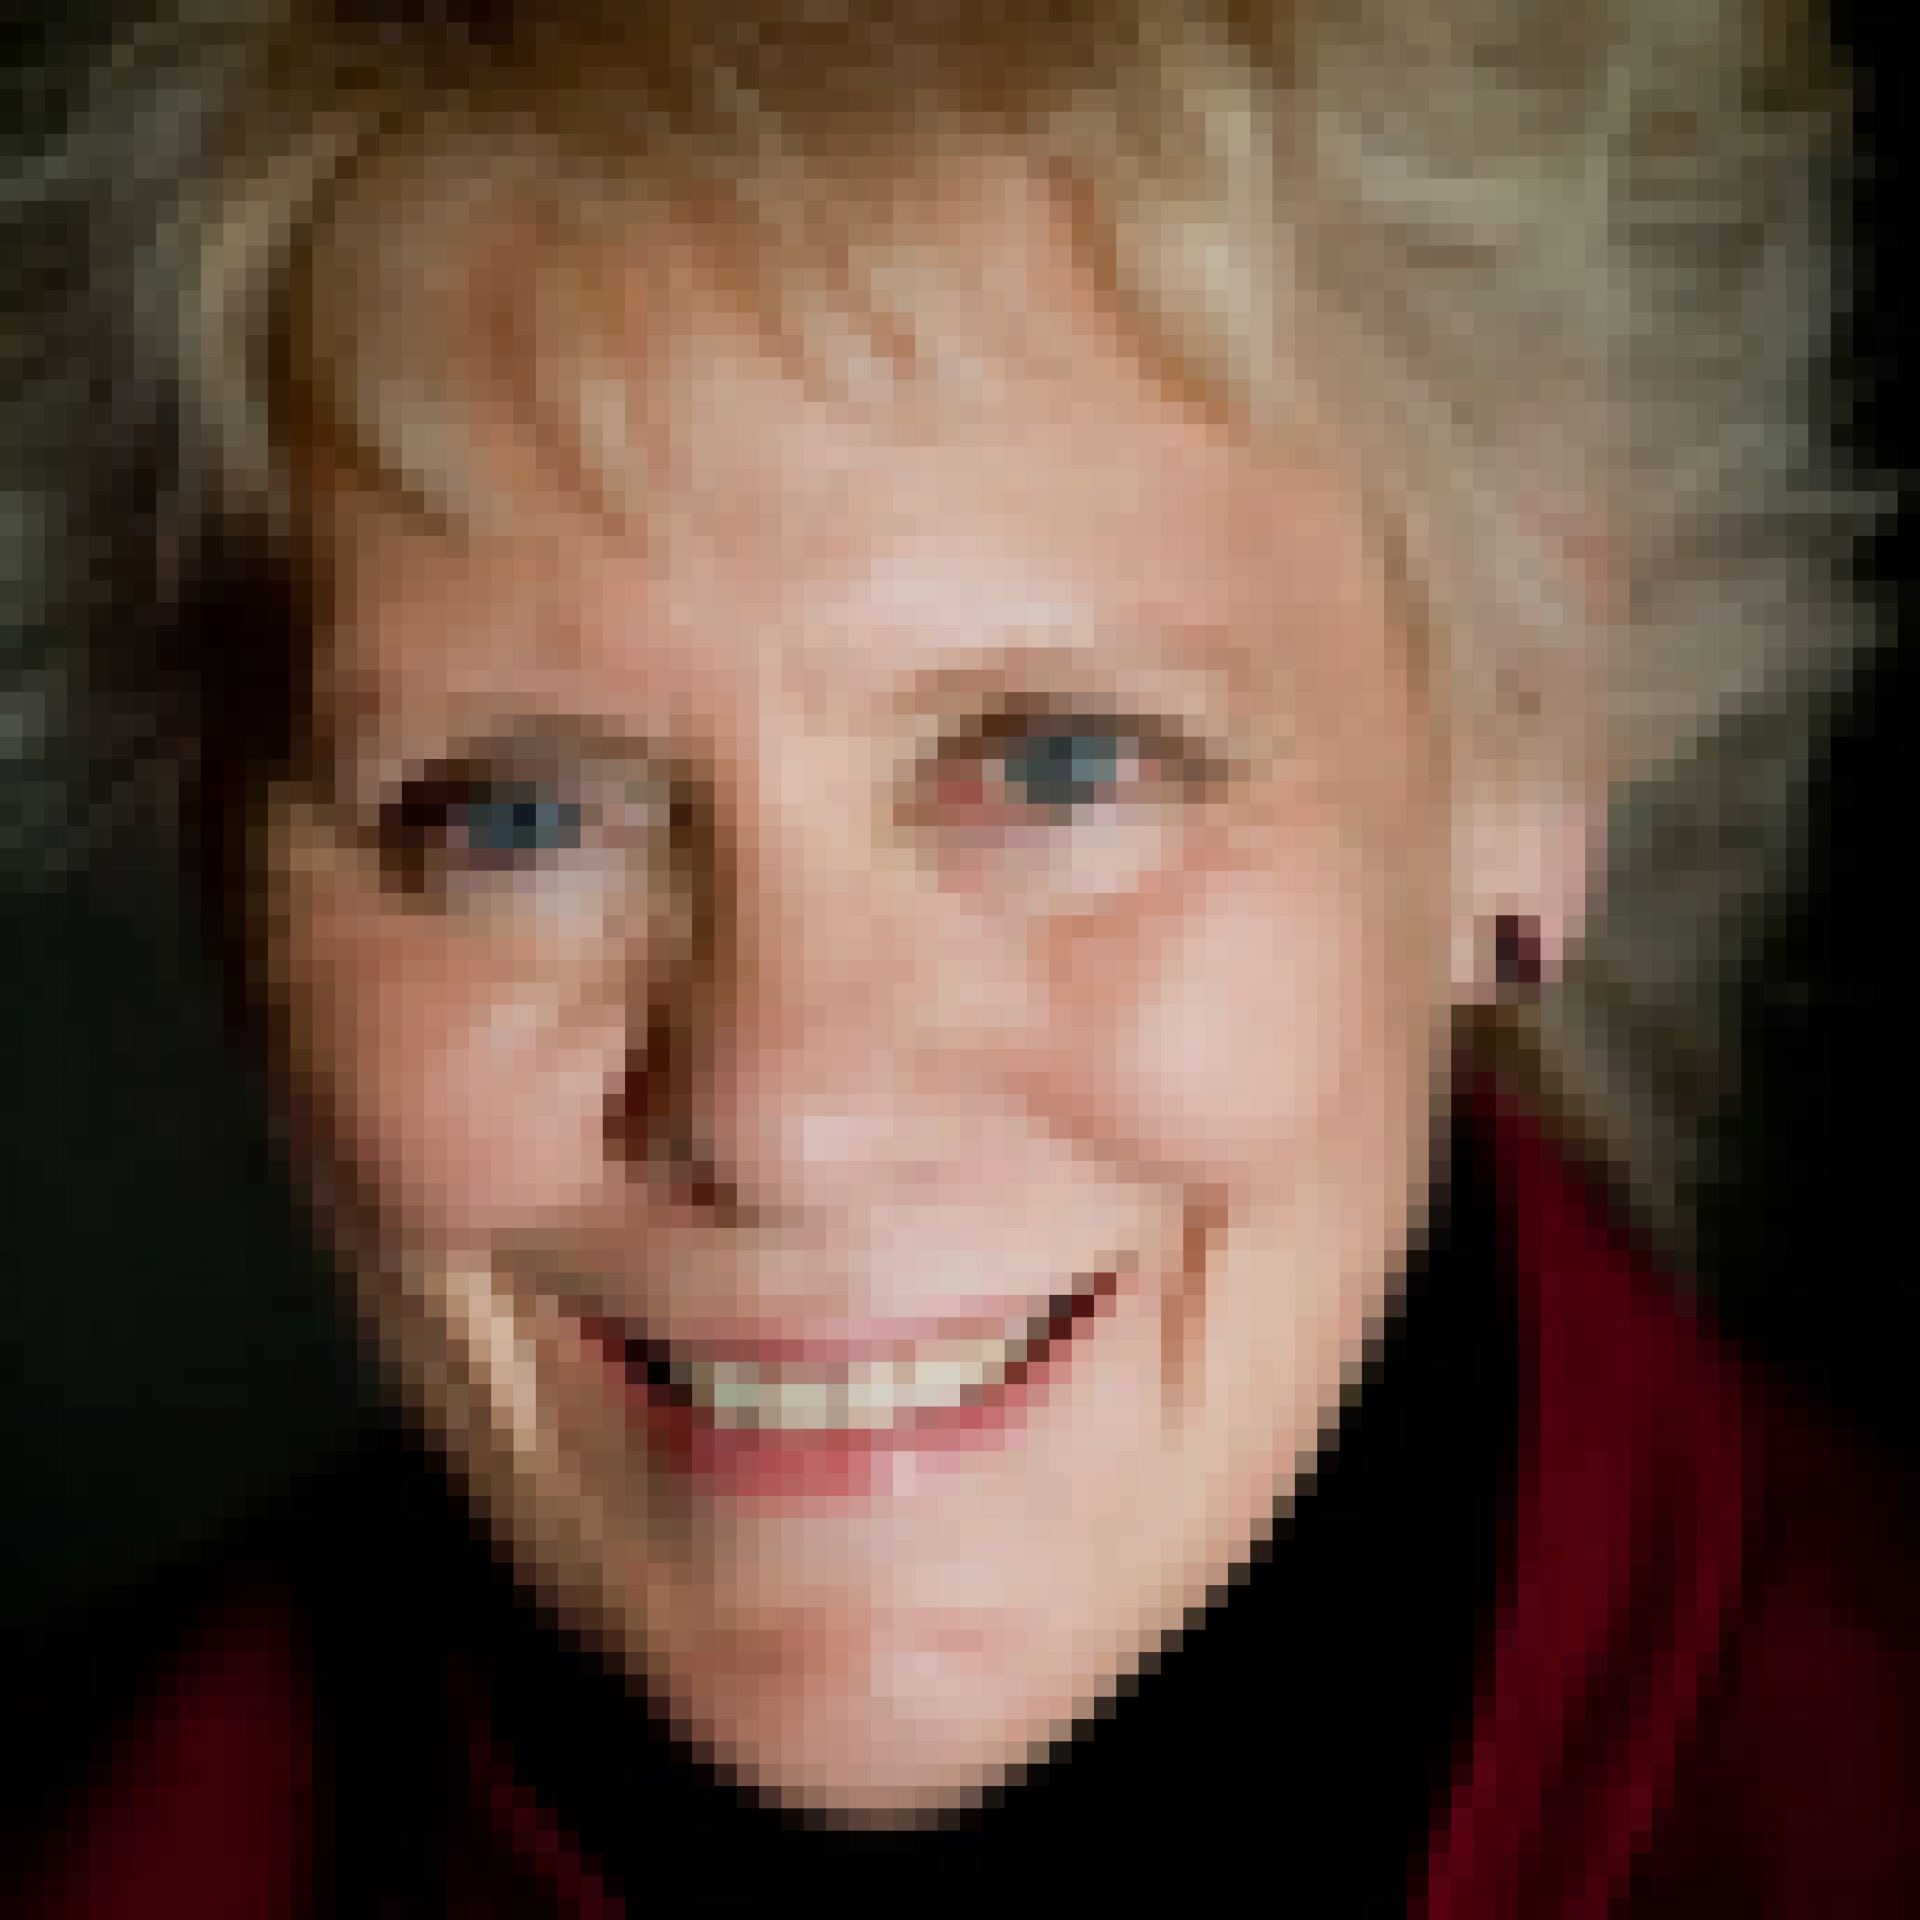 Marita Fridjhon